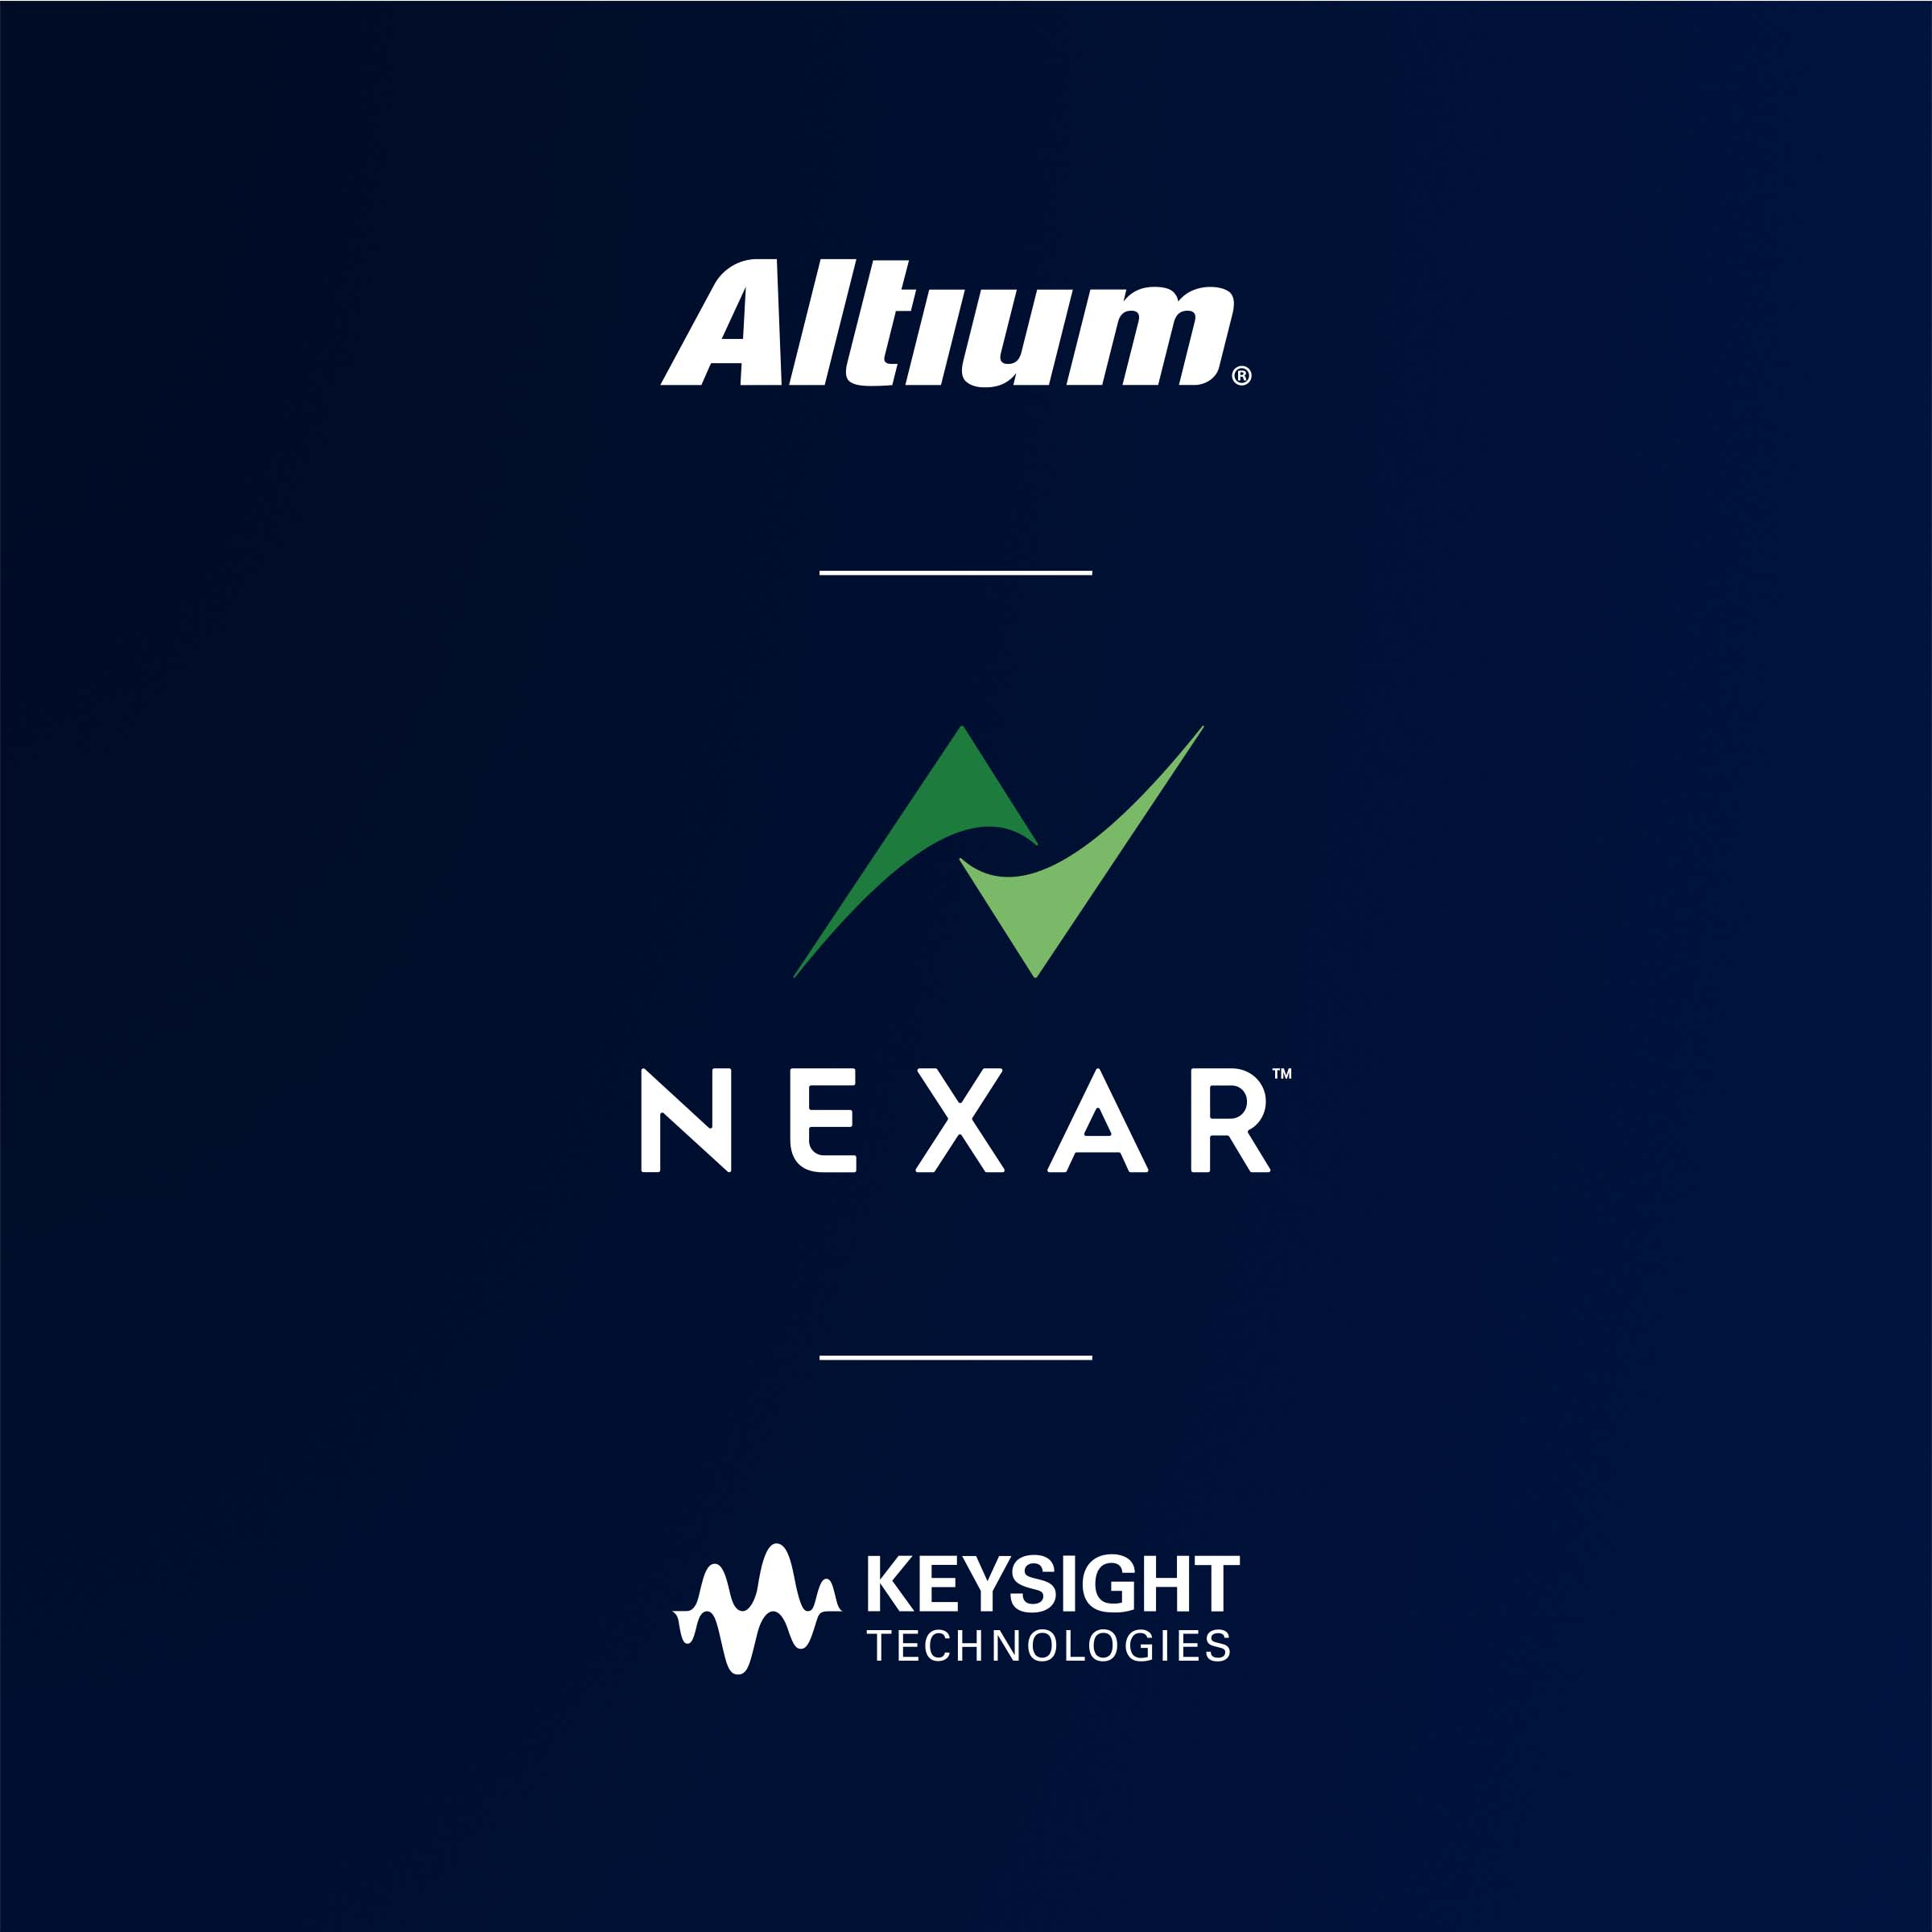 Keysight Technologies Joins Altium's Nexar Partner Program